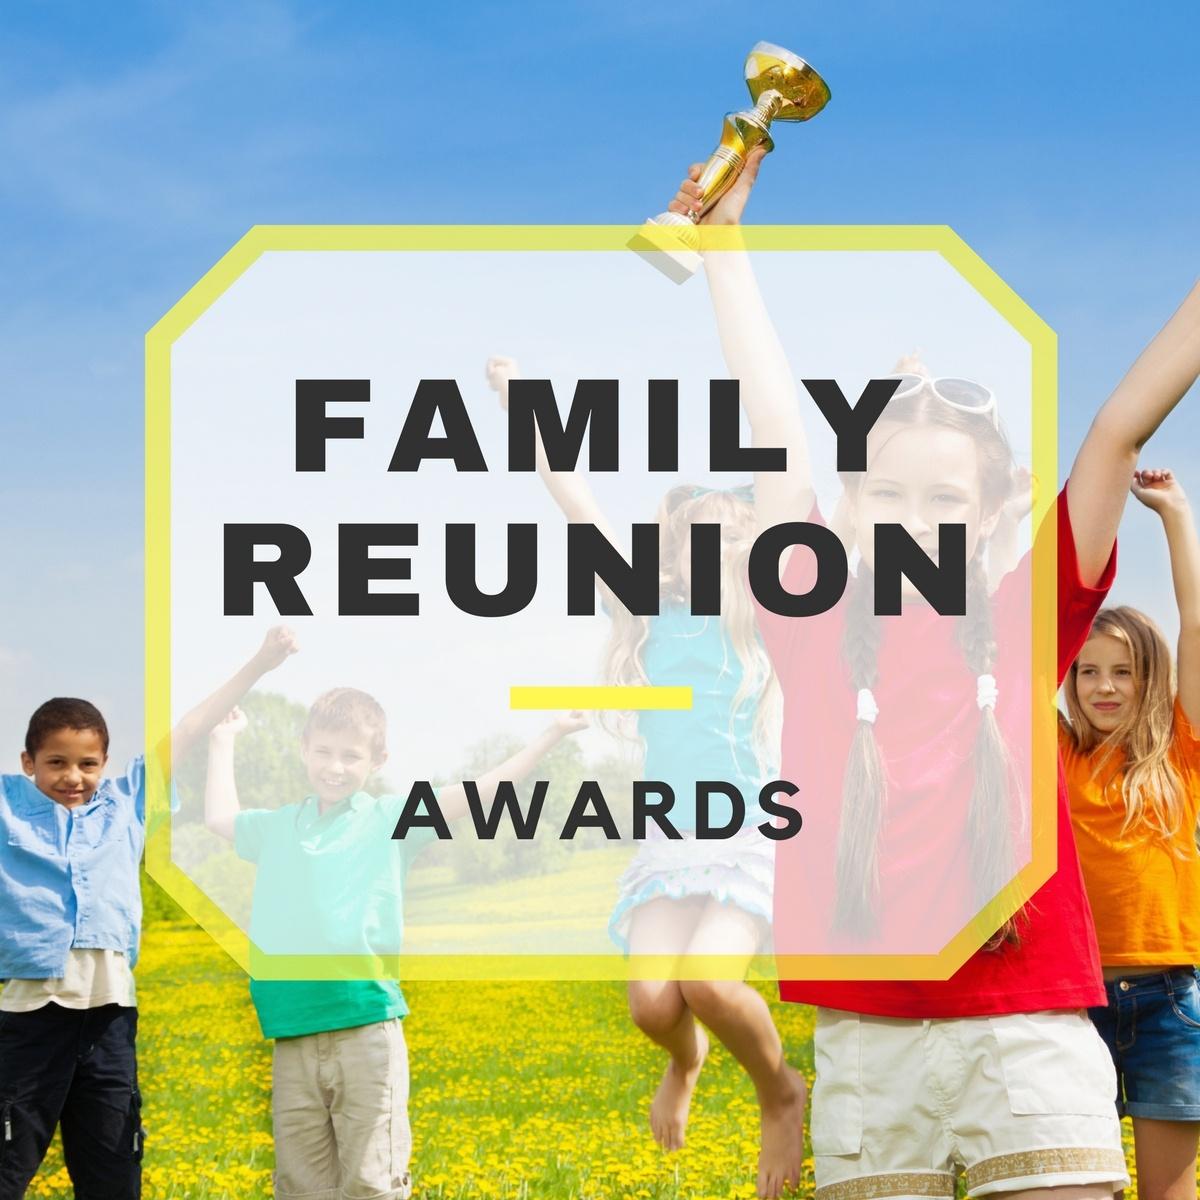 Family Reunion Awards - Free Printable Family Reunion Awards